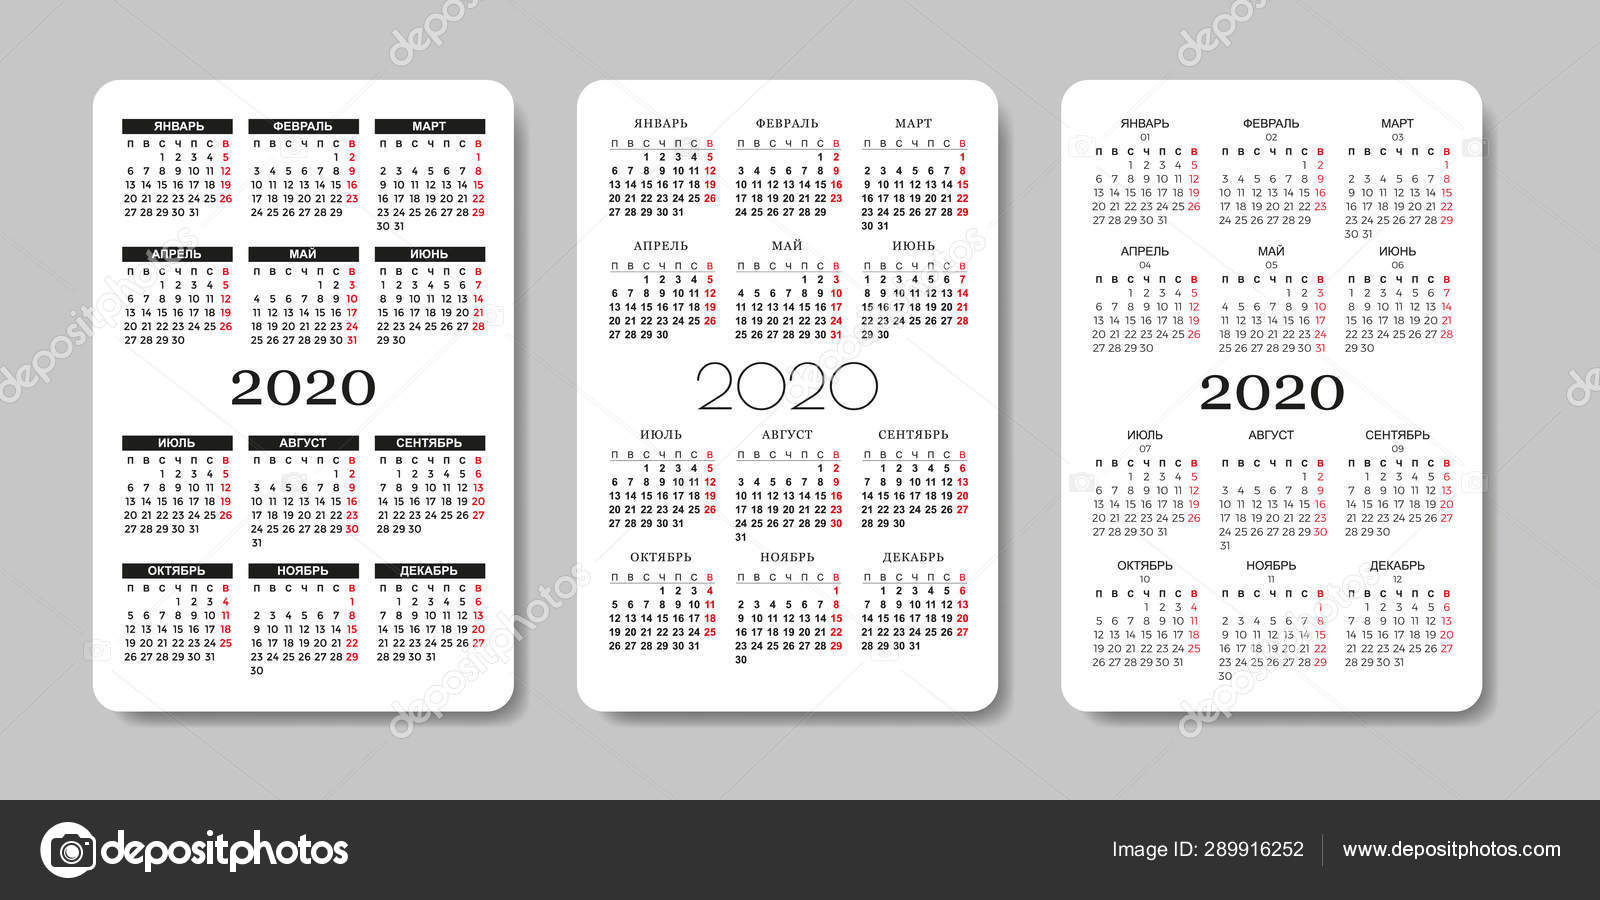 Get Depo Calendar 2020 | Calendar Printables Free Blank with regard to Depo Provera Injection Calendar 2021